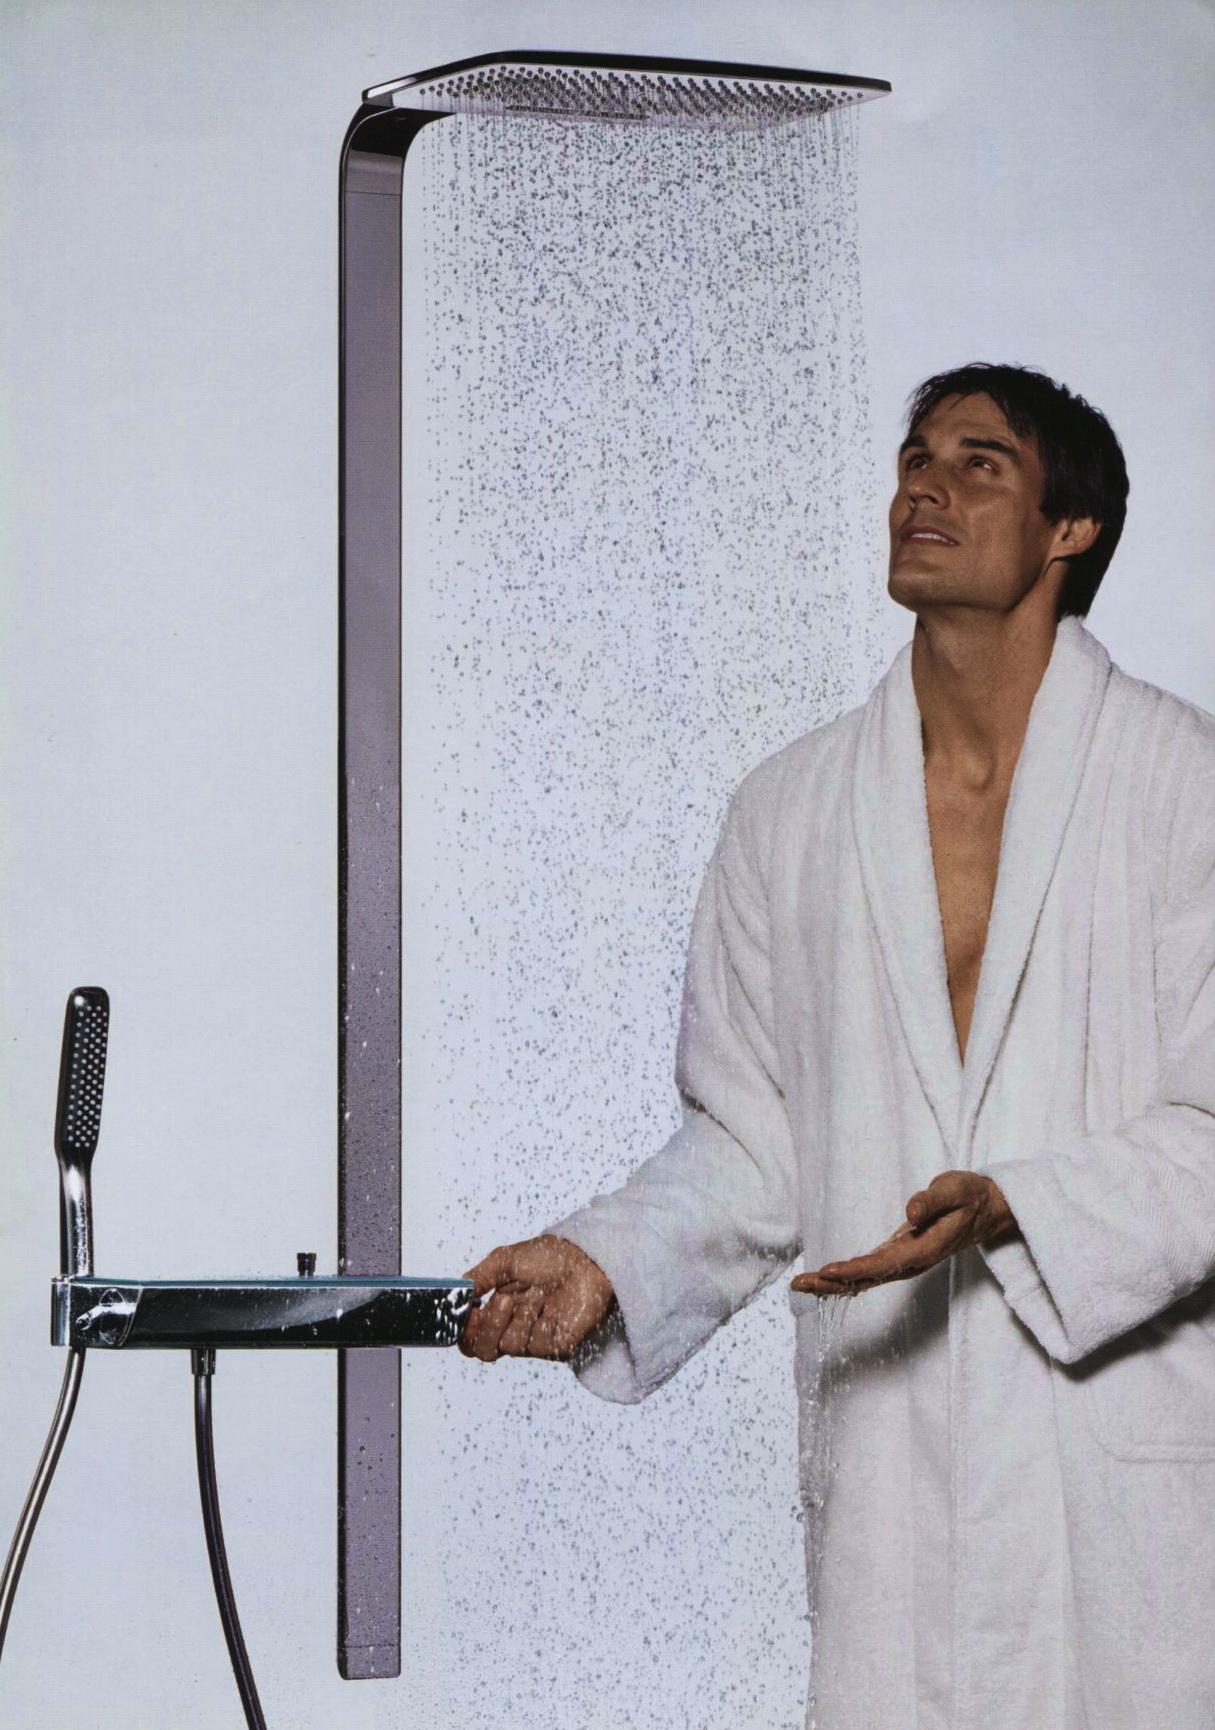 Мужчина и тропический душ в ванной комнате